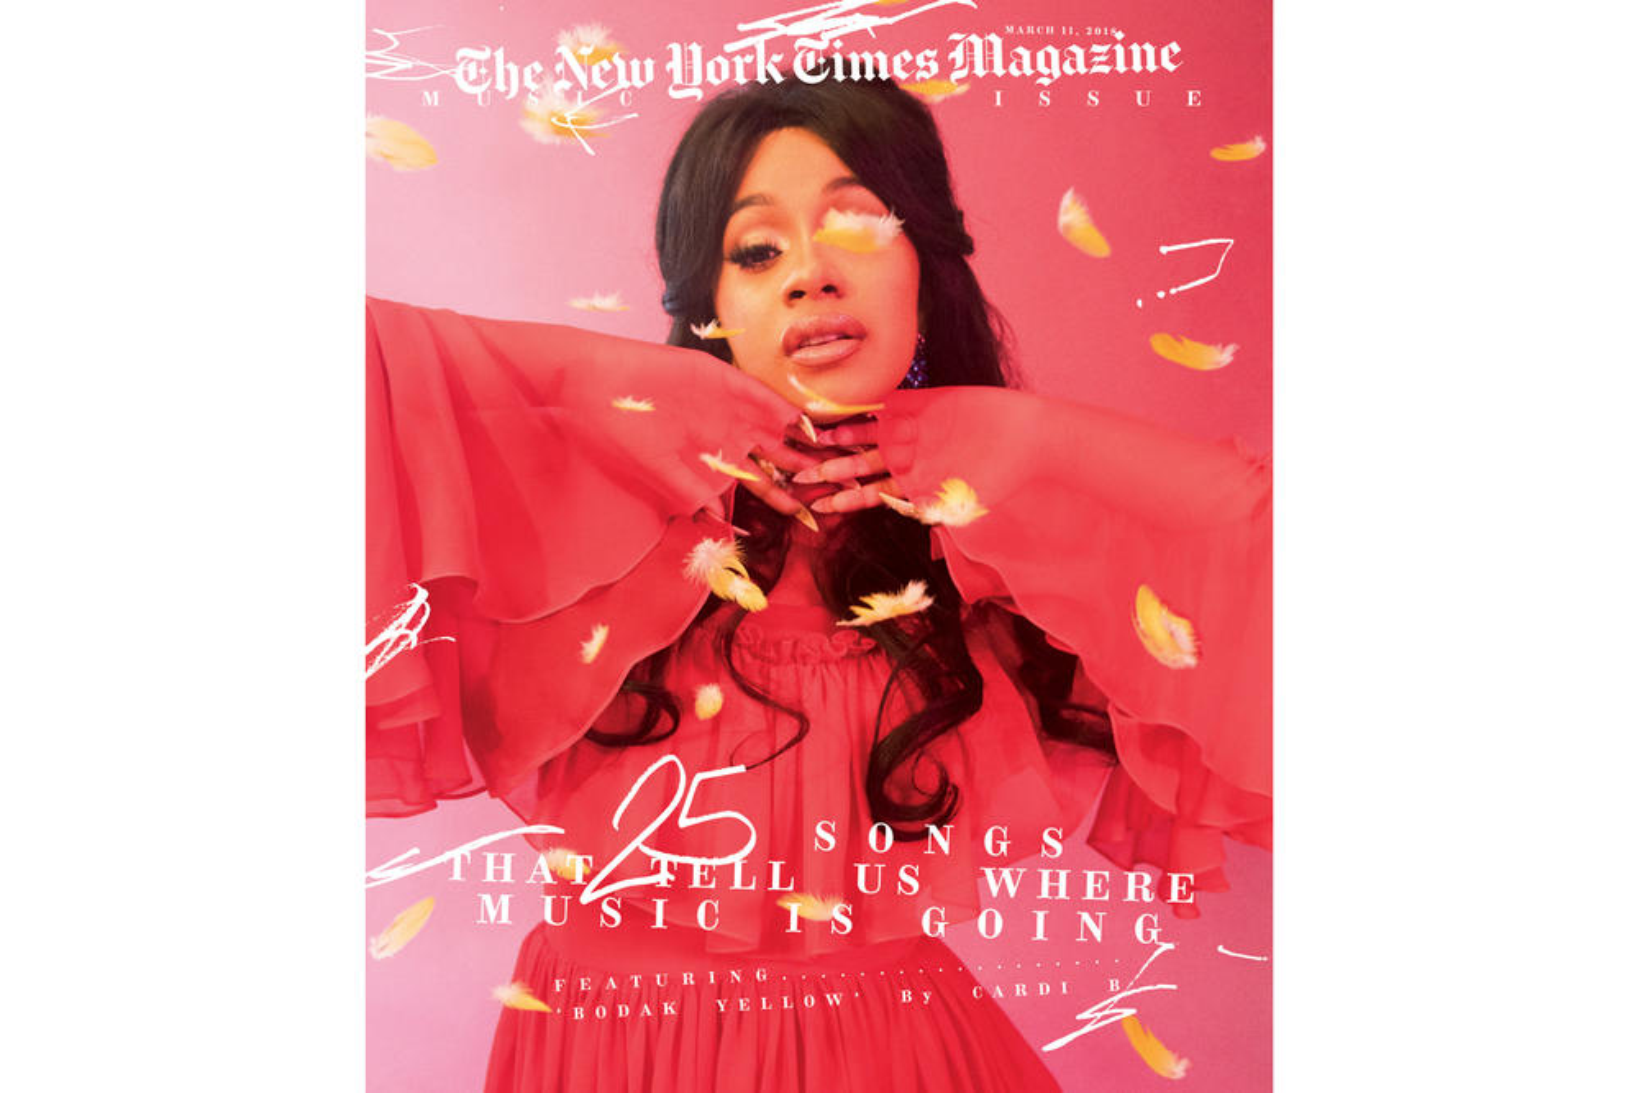 Cardi B SZA New York Times Magazine Music Cover